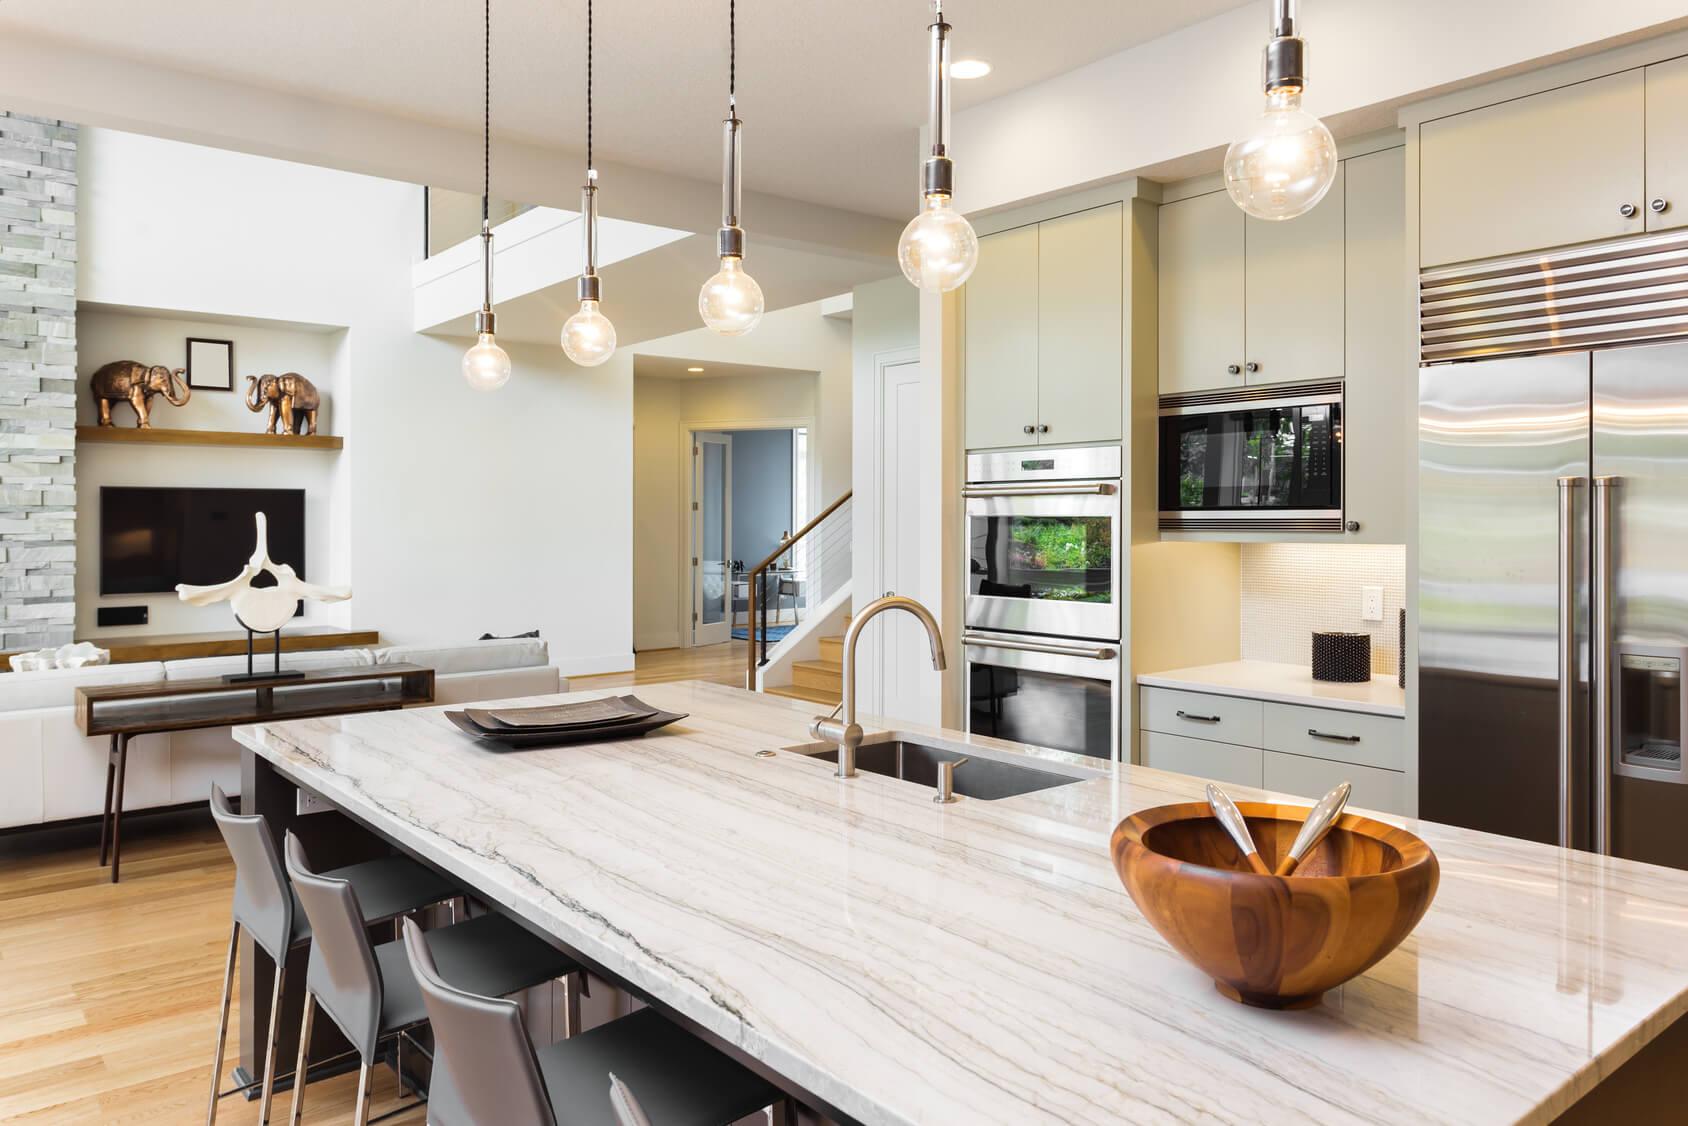 Kitchen Project -1010 - Superior Renovation & Construction